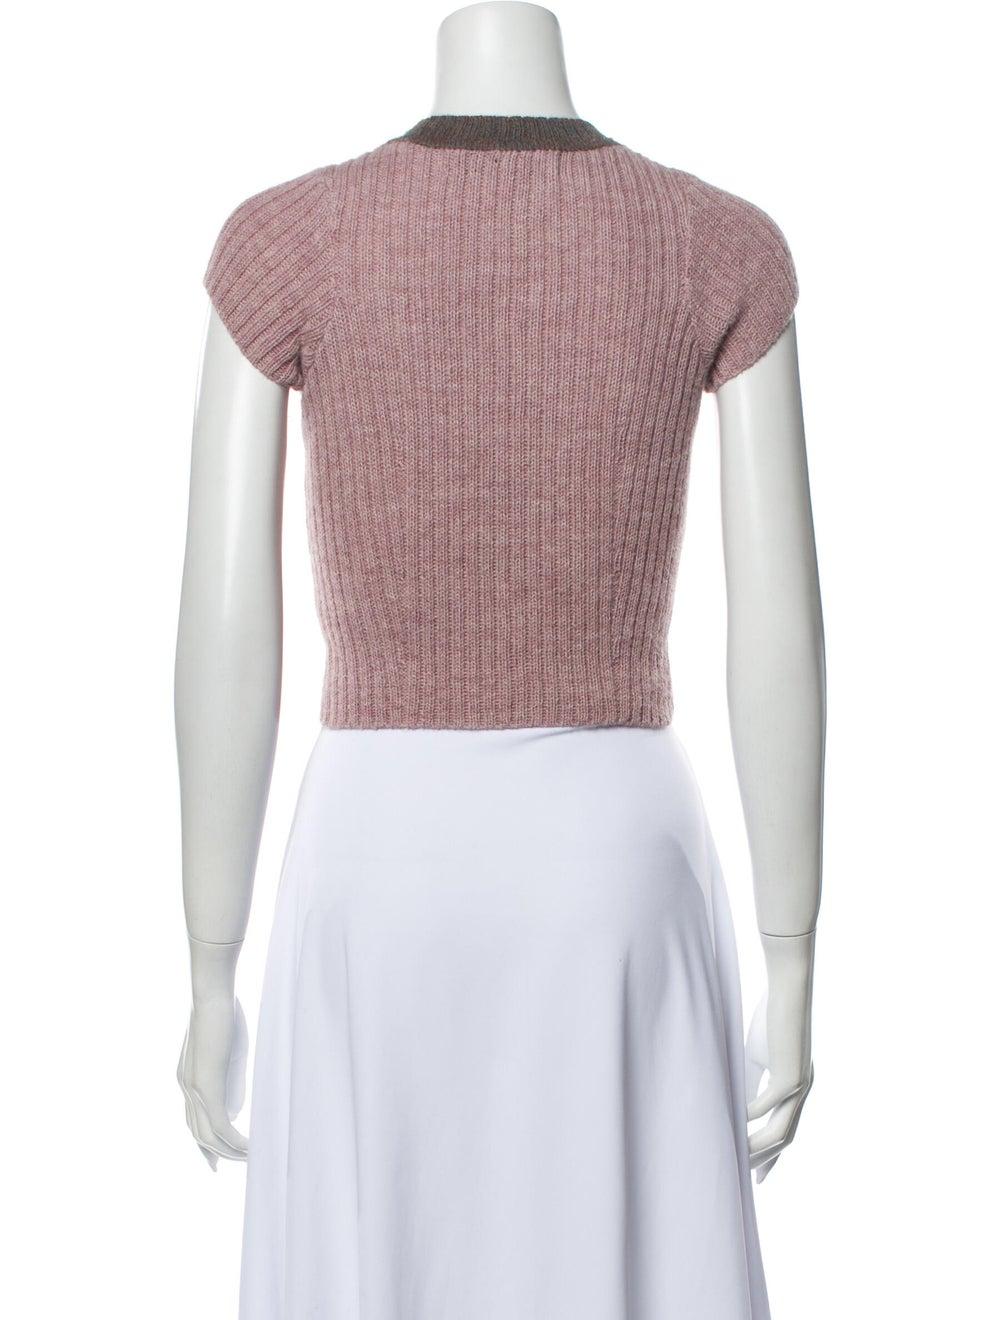 Eckhaus Latta Alpaca Crew Neck Sweater Pink - image 3